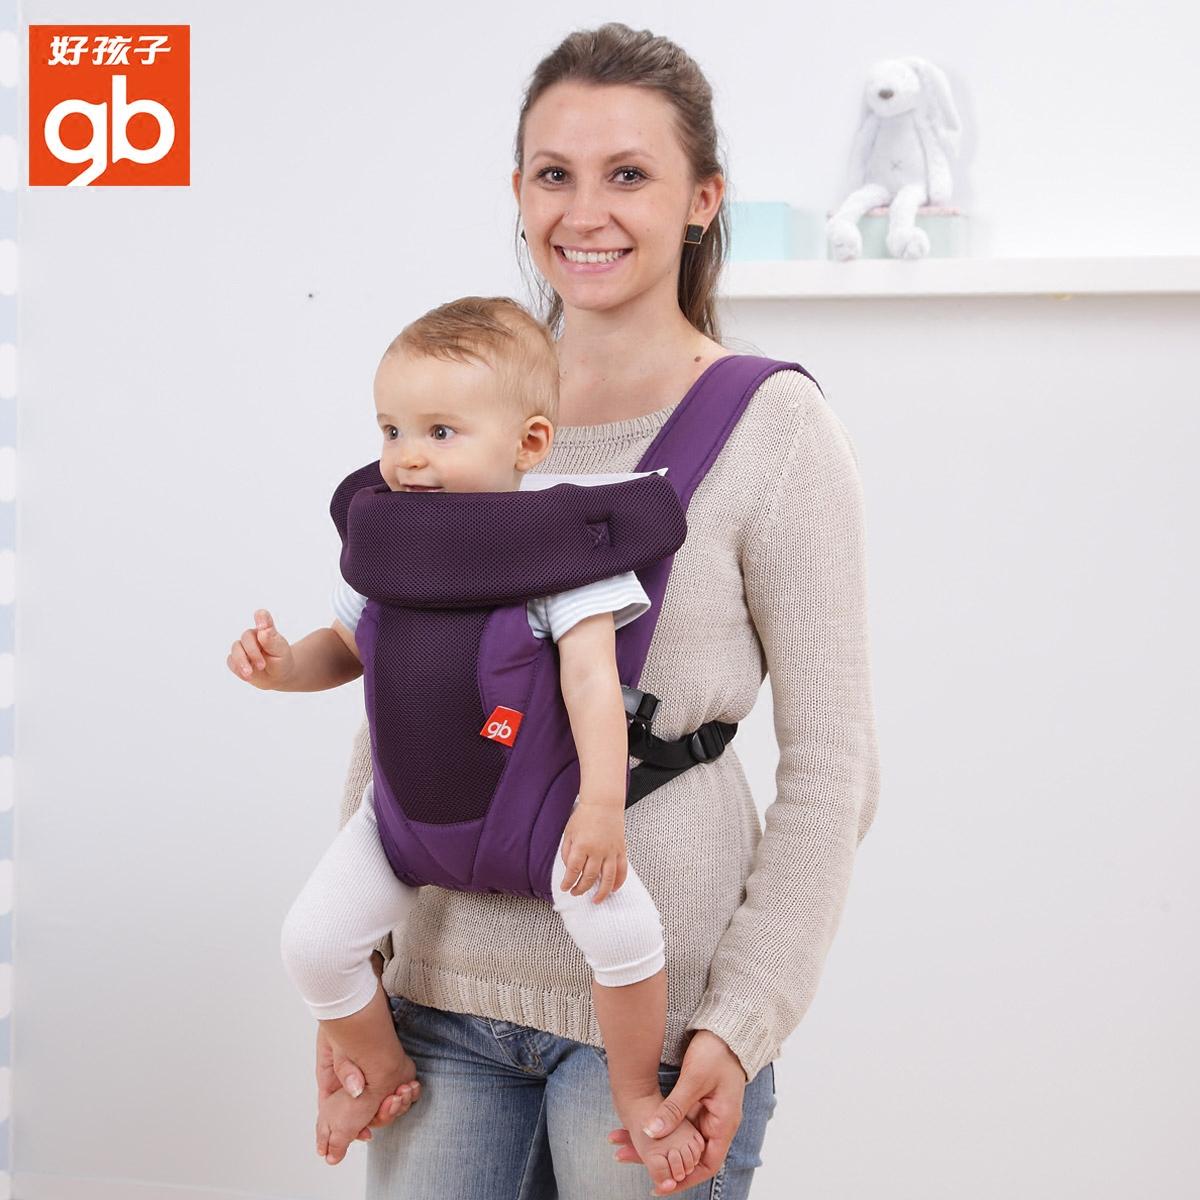 gb好孩子婴儿背带多功能前抱式腰凳